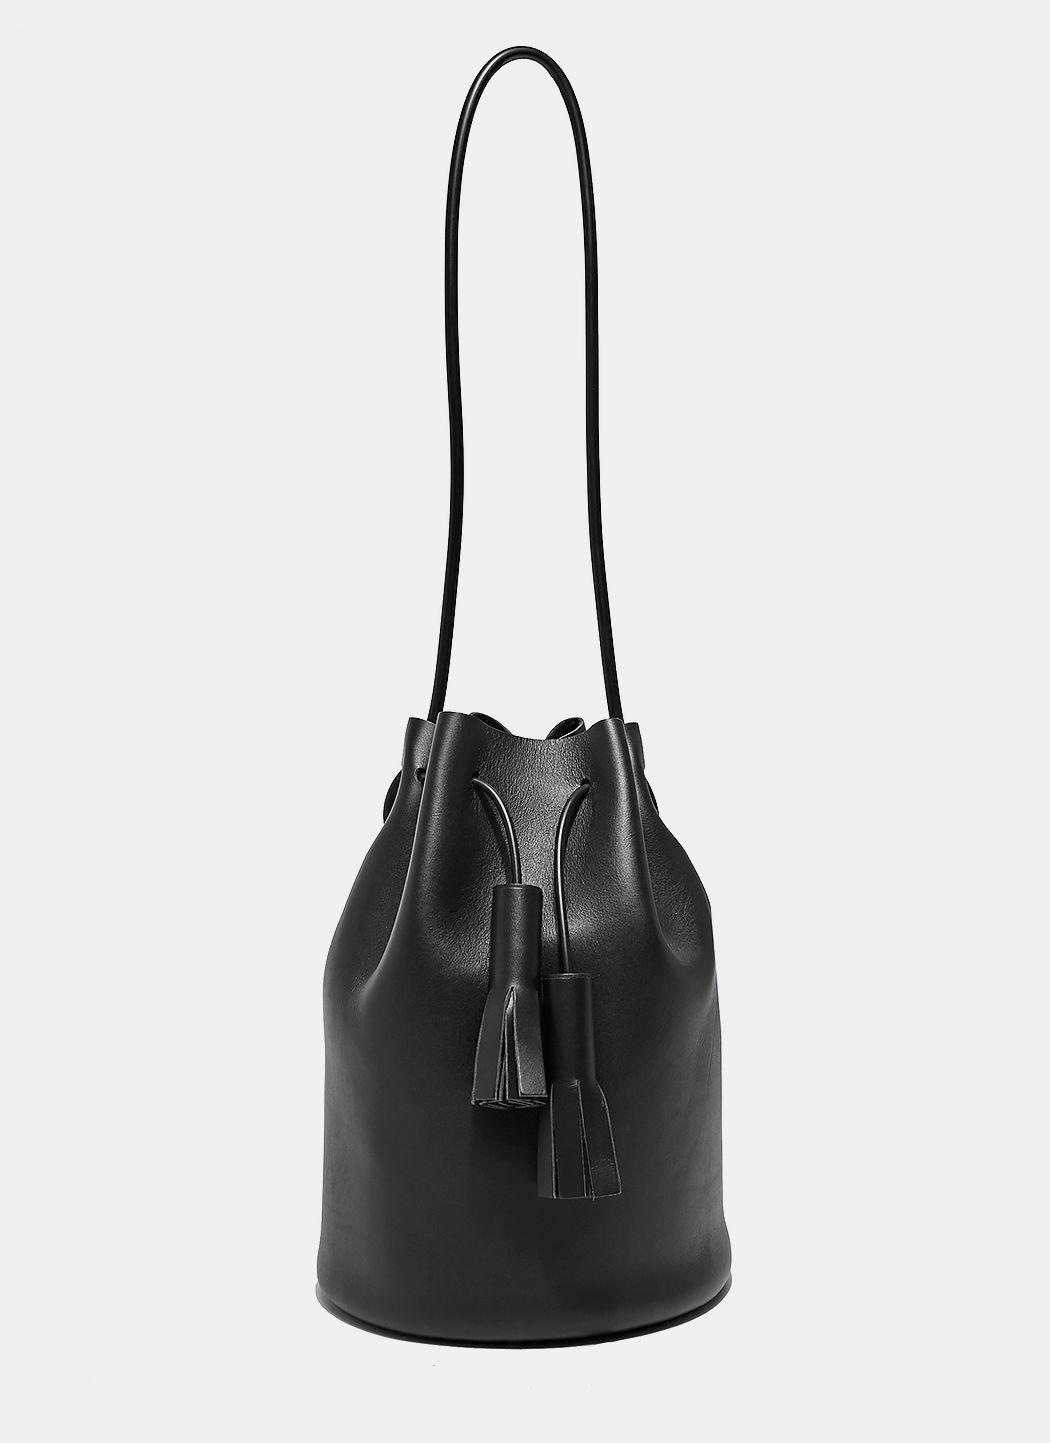 Building Block Women S Black Leather Bucket Bag